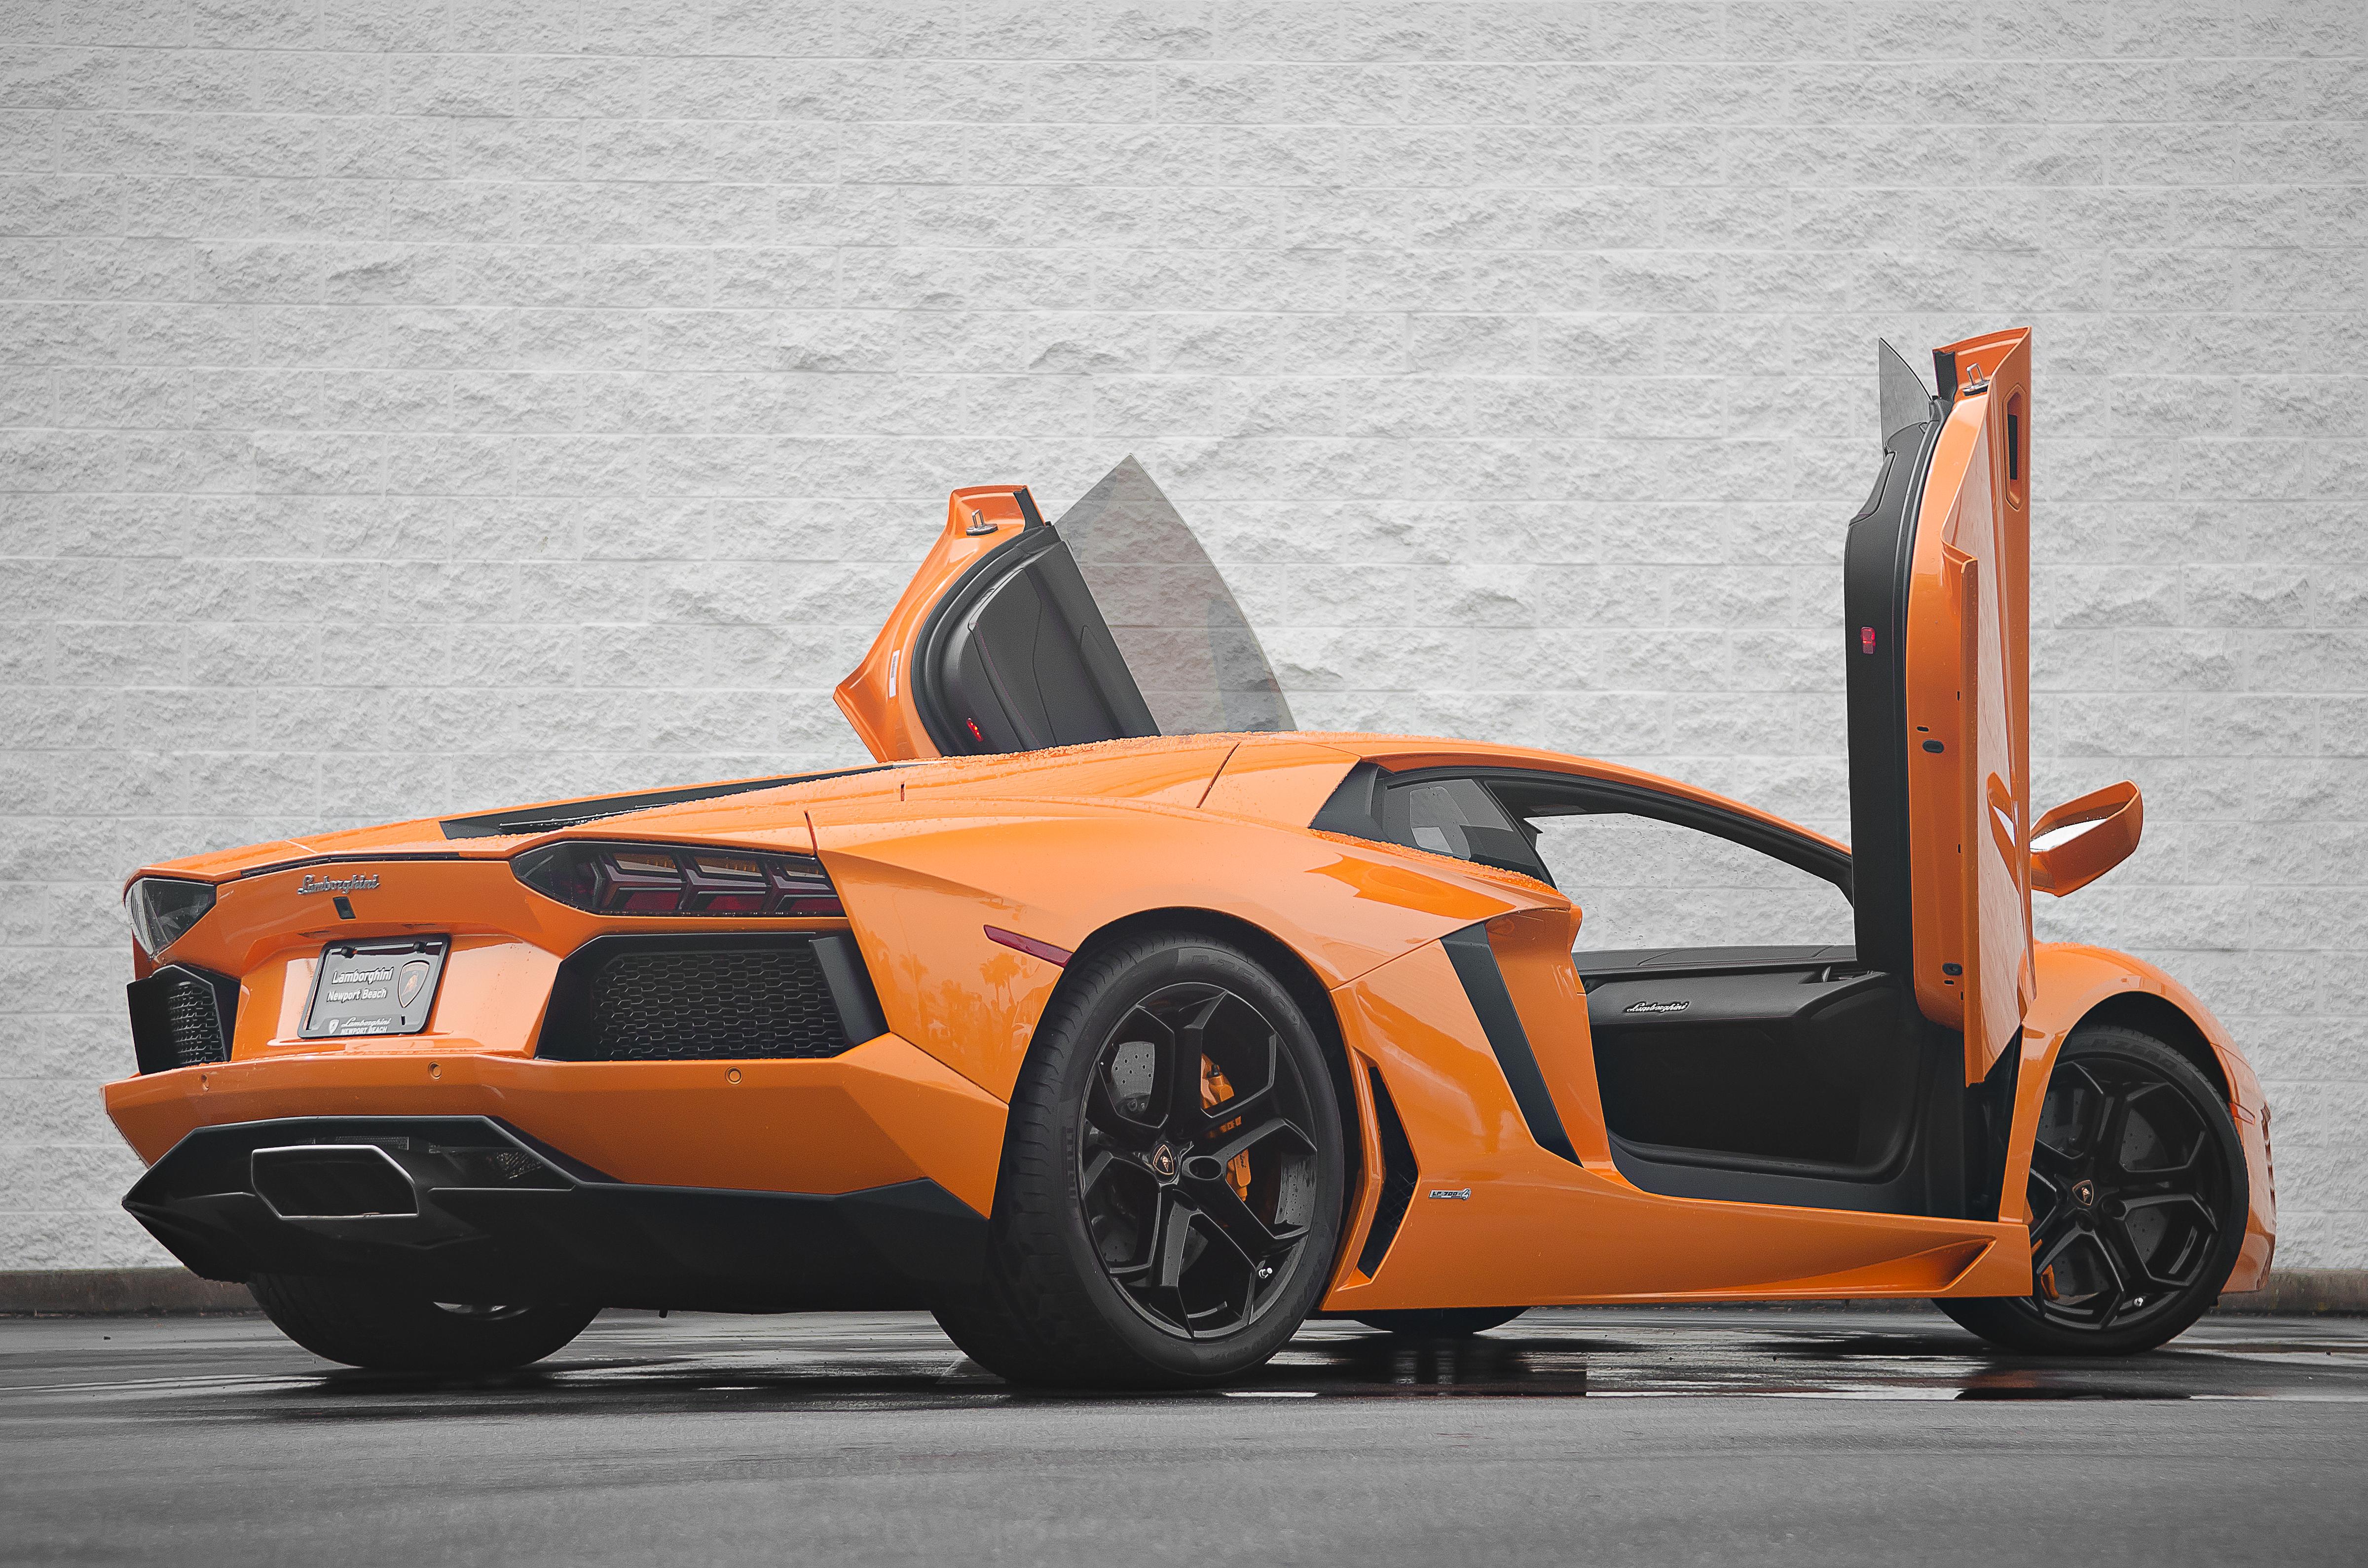 Archivo Orange Lamborghini Aventador Lp700 13958653933 Jpg Wikipedia La Enciclopedia Libre